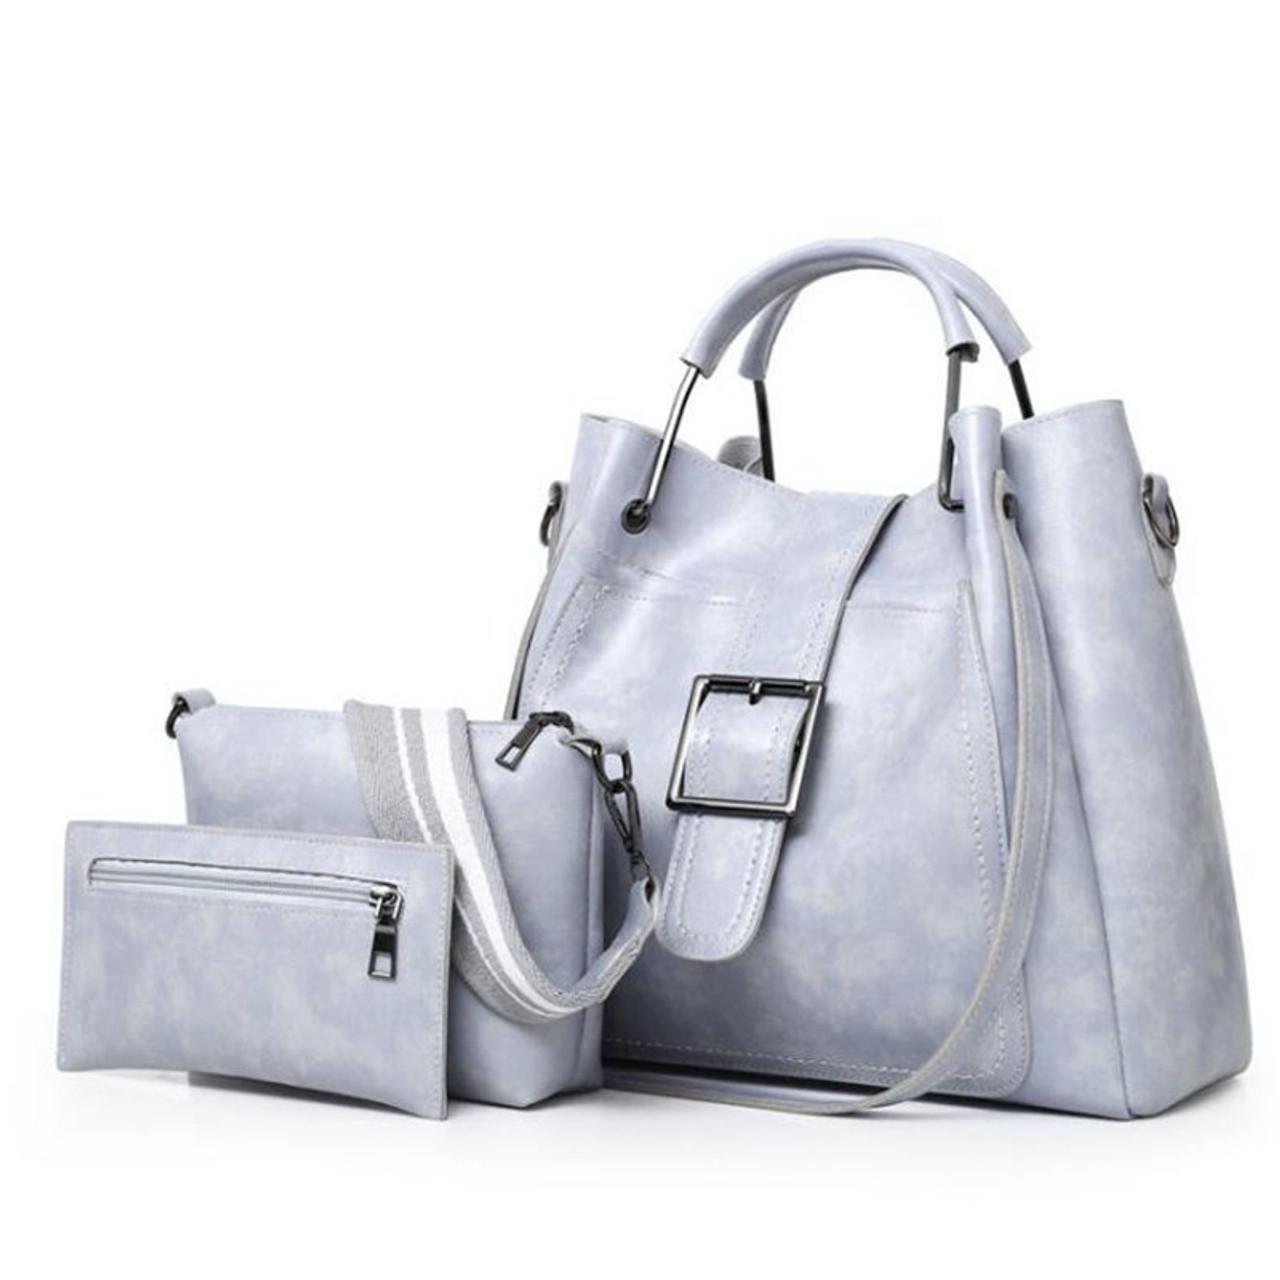 ... Women s Messenger Bag Women Bags Leather Luxury Handbags Famous Brands  Female Shoulder Bags Designer Crossbody Bags ... 335dc5ea213fc